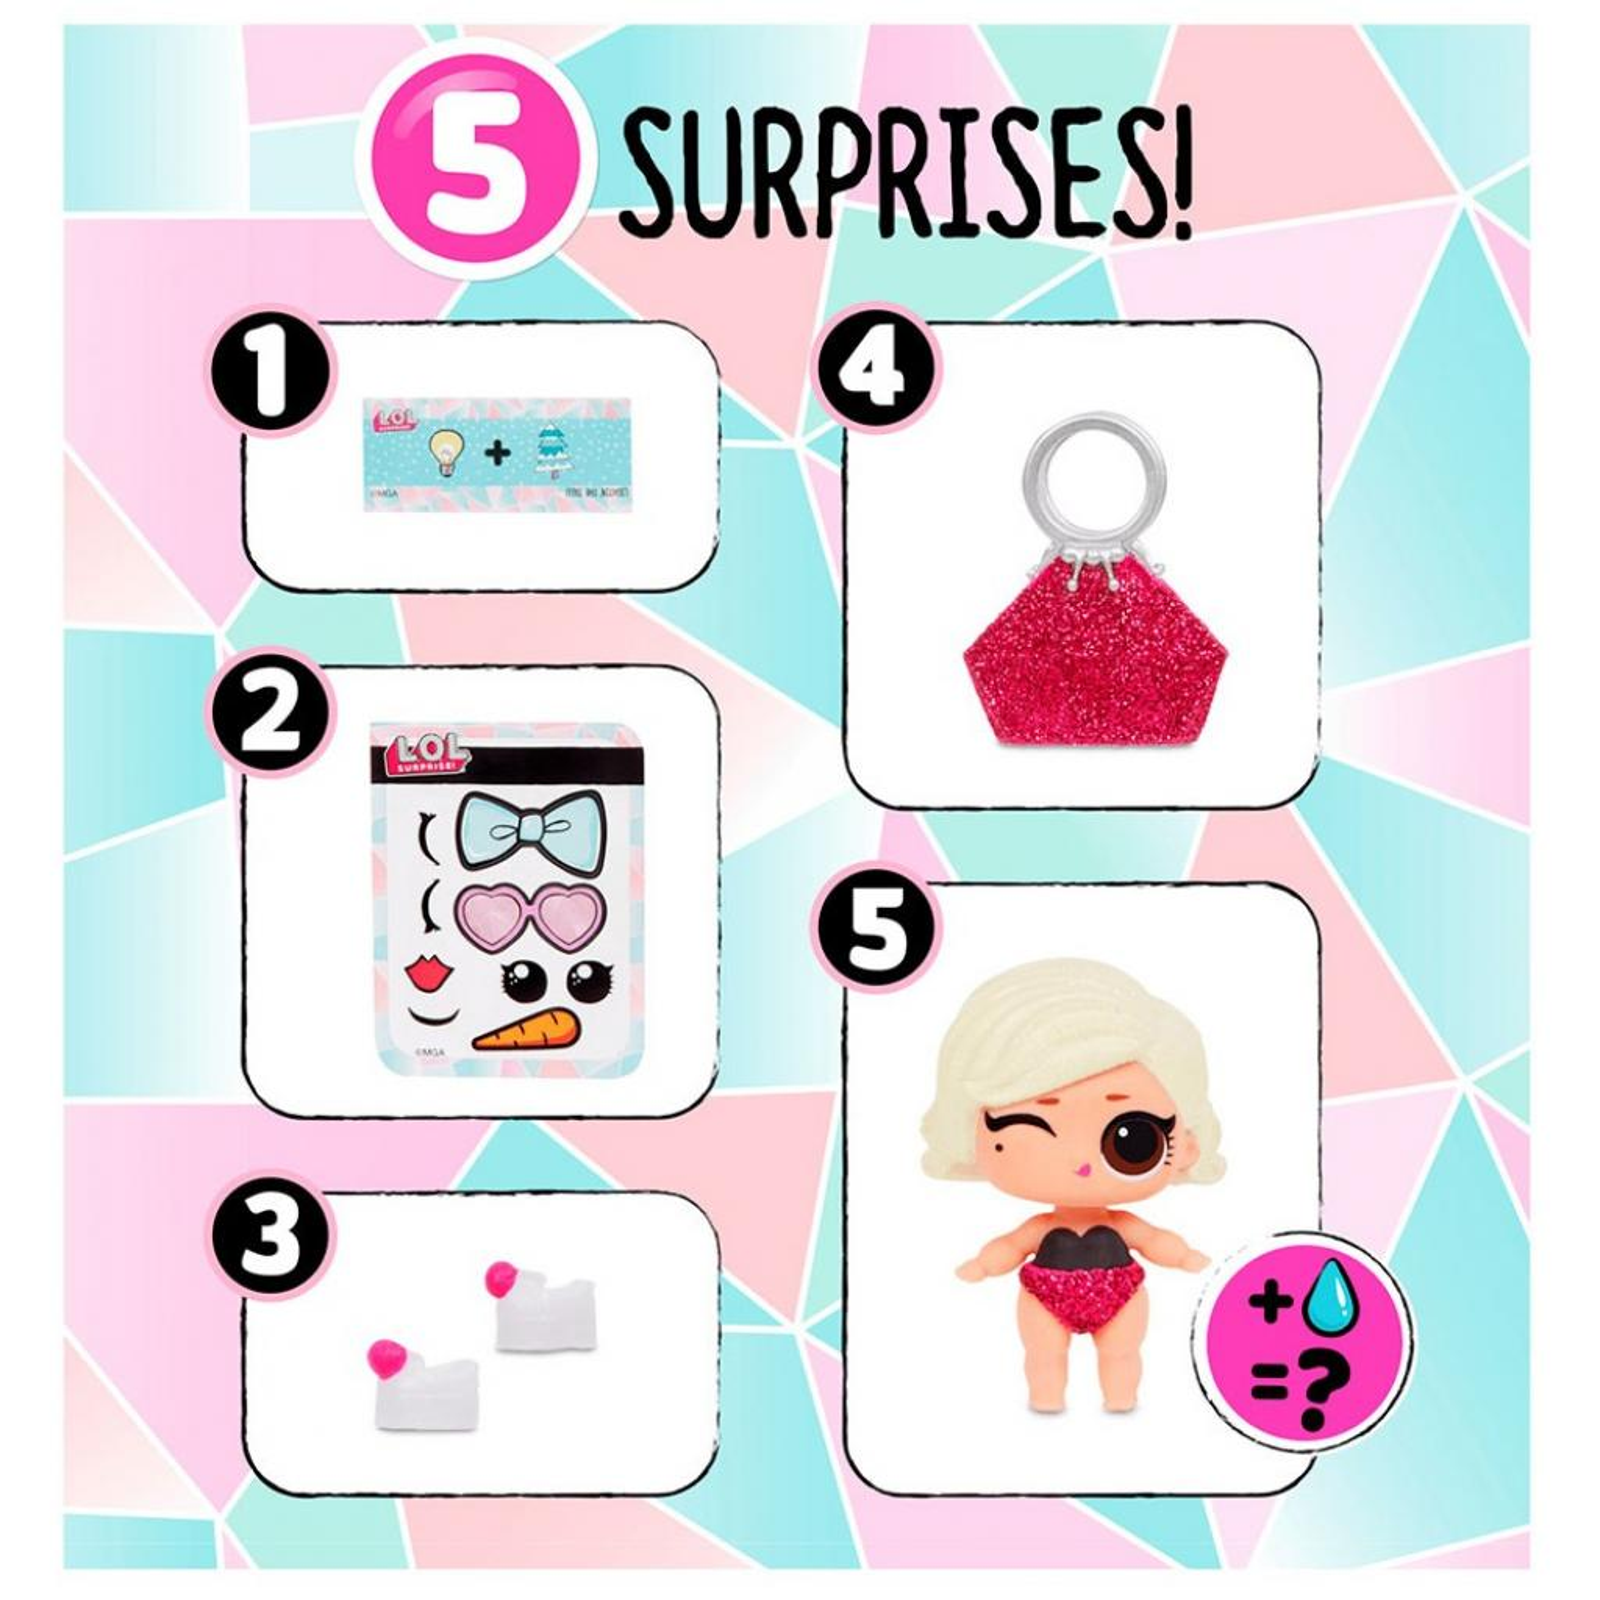 Кукла L.O.L. Surprise! серии Lil's Winter Disco - Малыши (559672) изображение 3